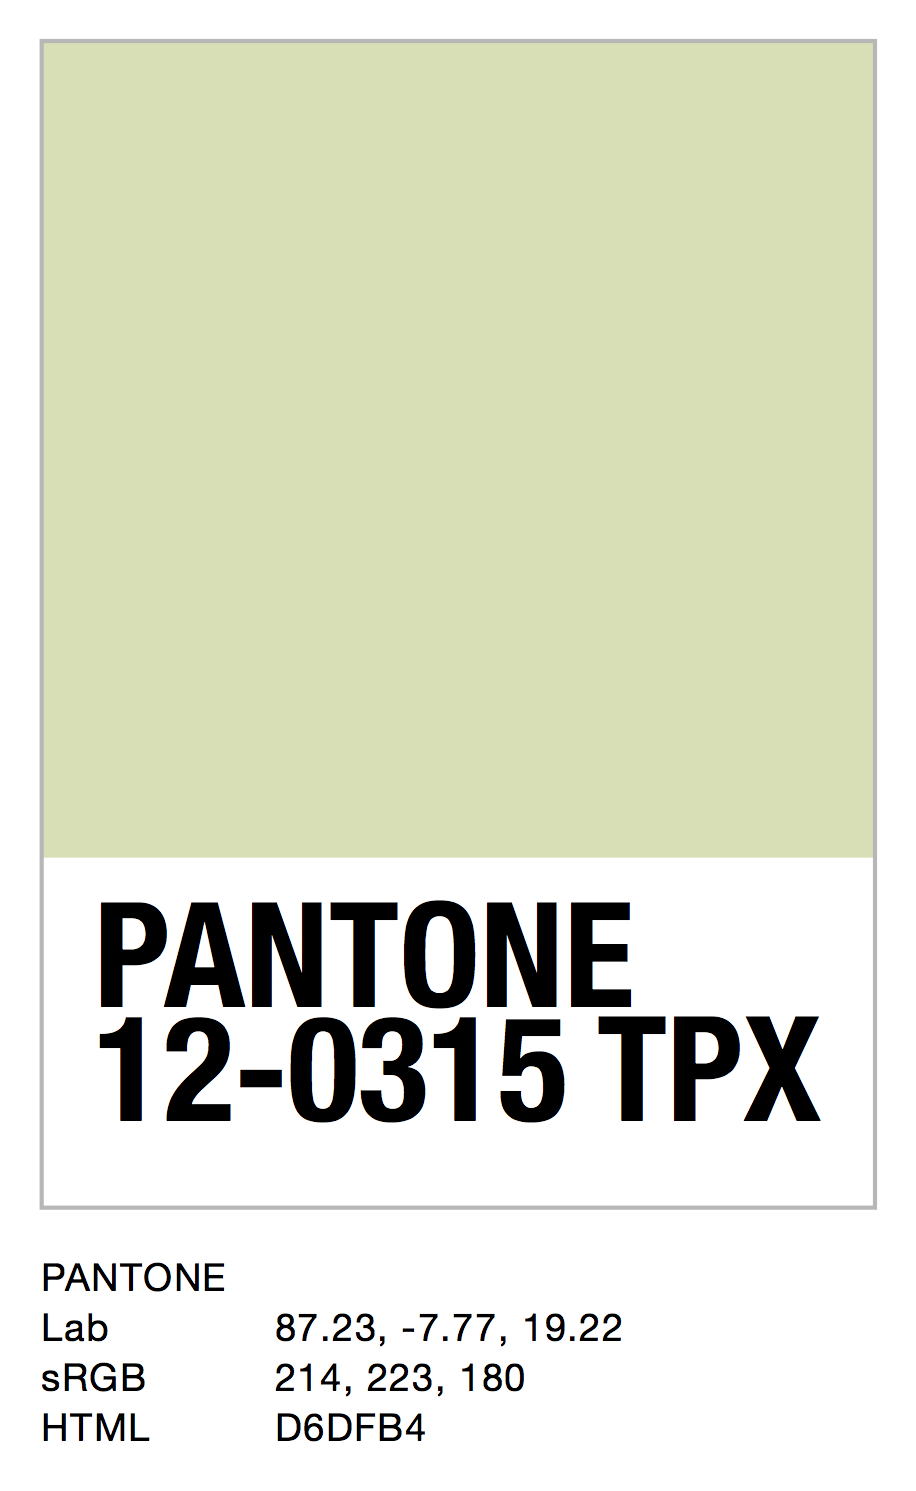 PANTONE 12-0315 TPX.jpg